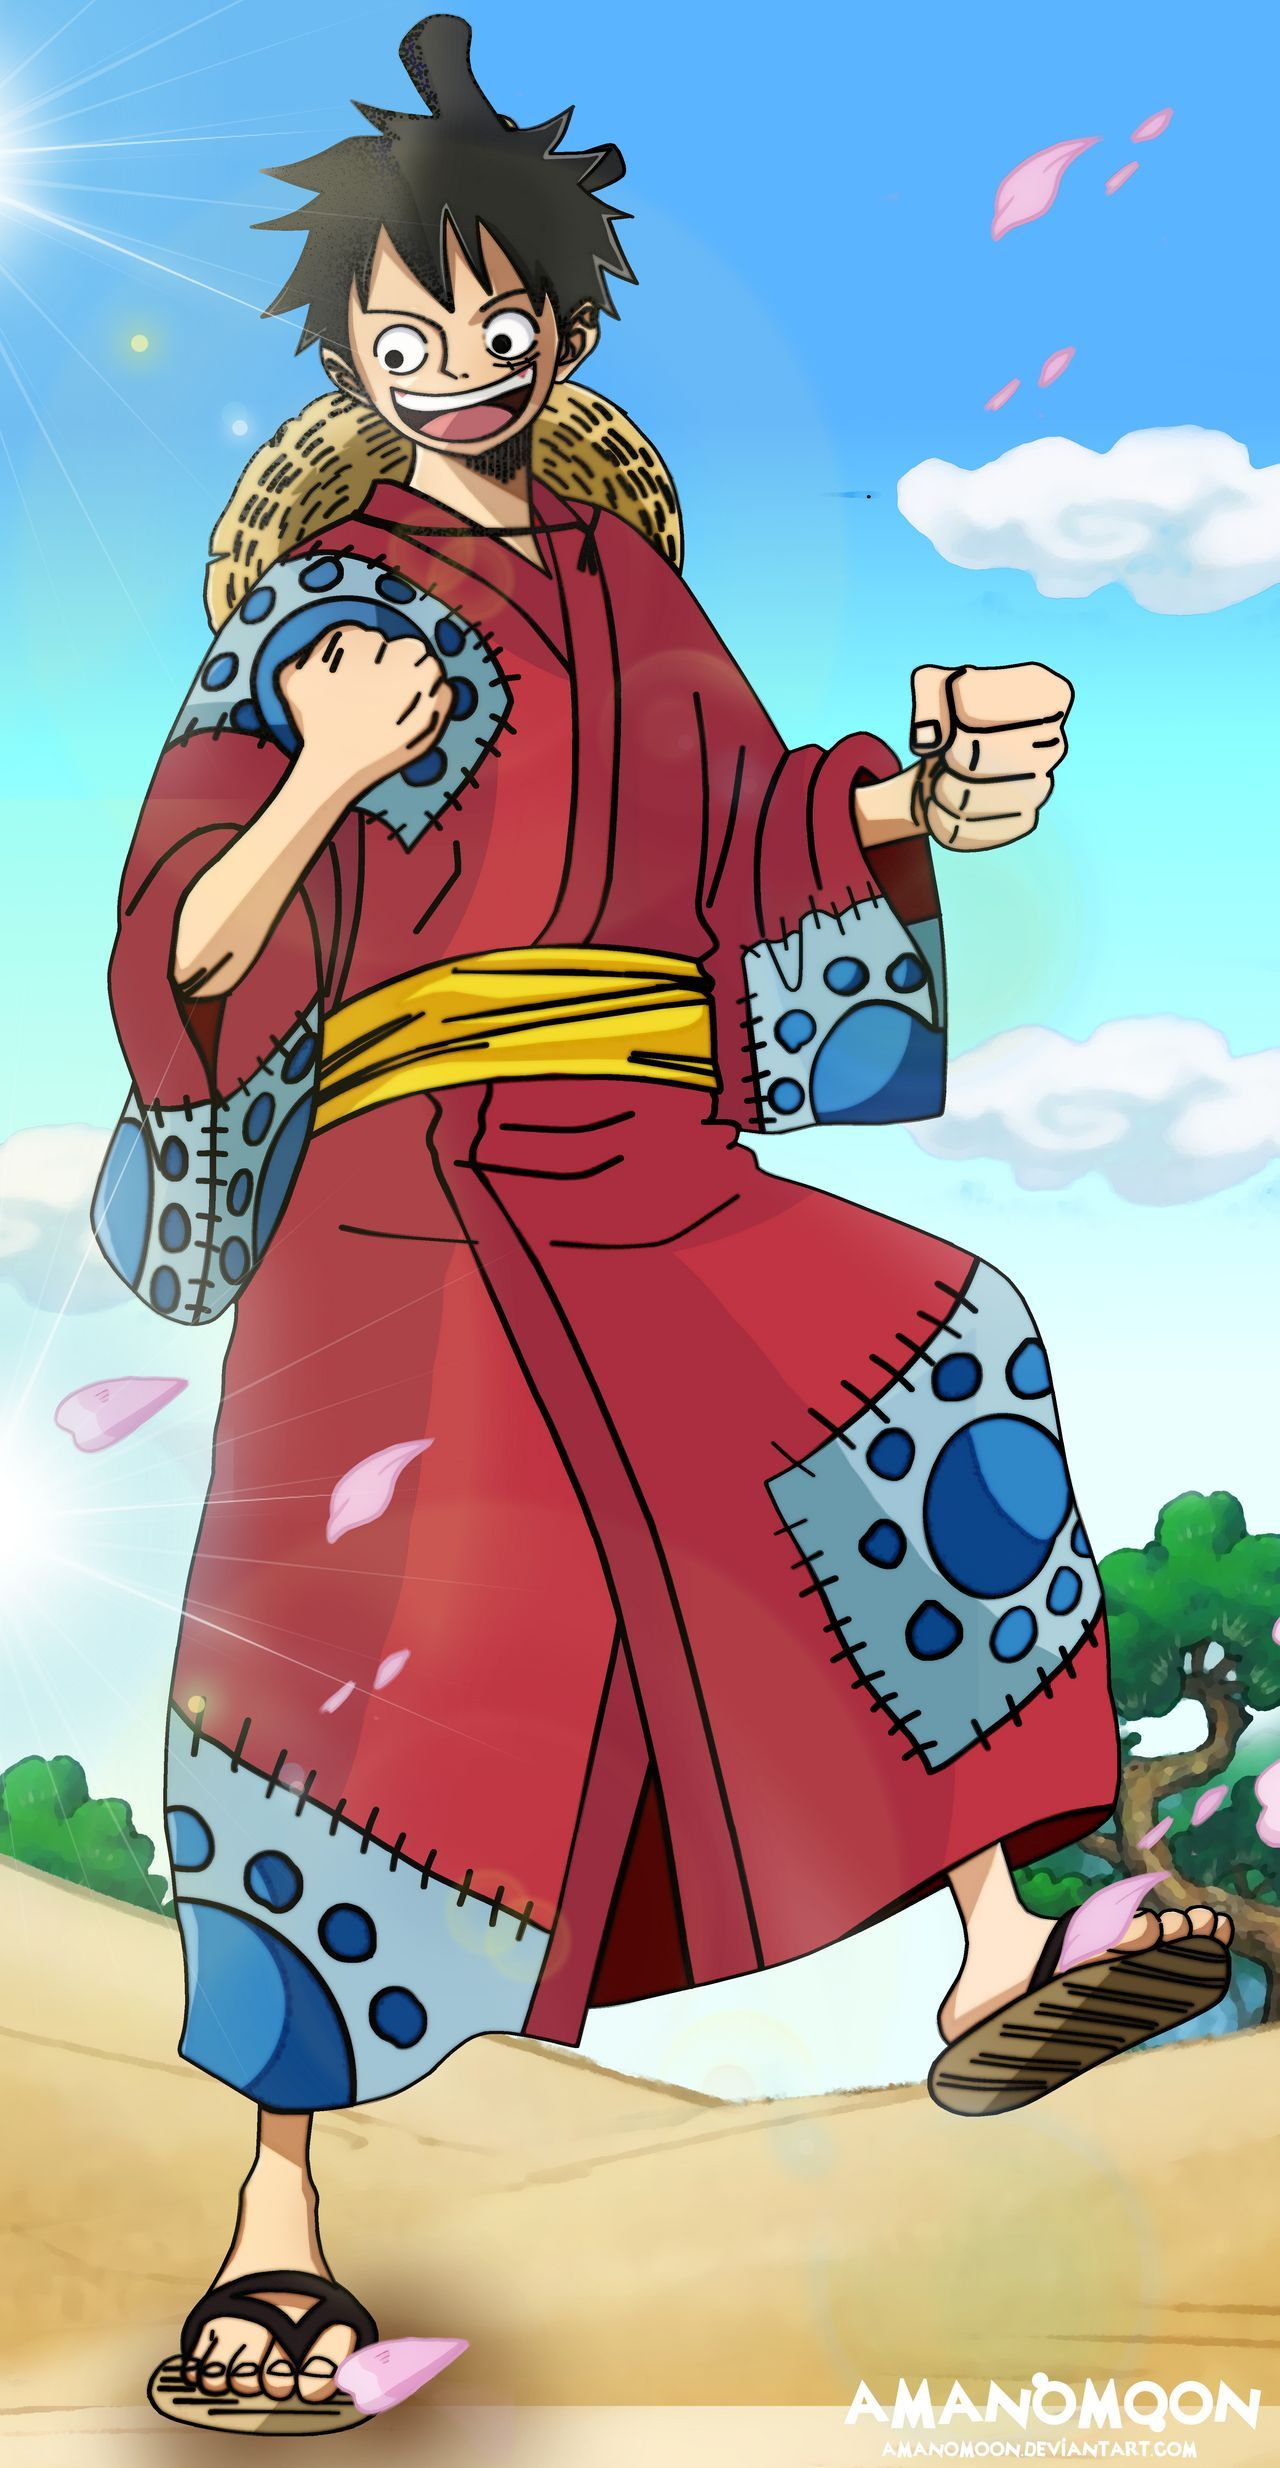 One piece chapter 941 zoro jiro hiyori wano kuni by amanomoon on deviantart. Pin On One Piece